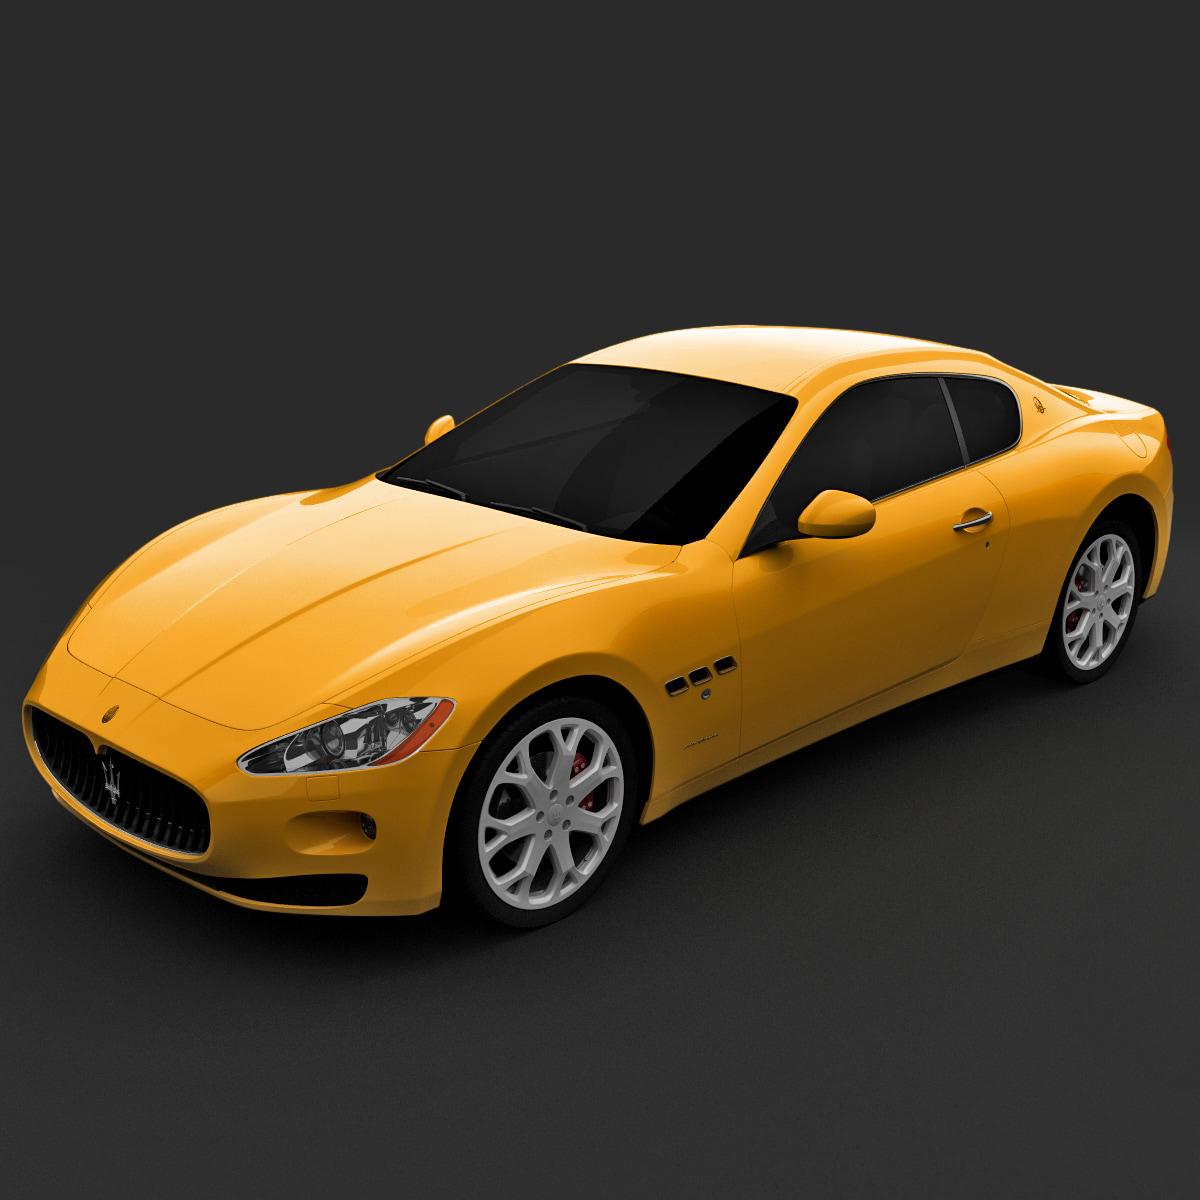 Maserati_GranTurismo_0001.jpg